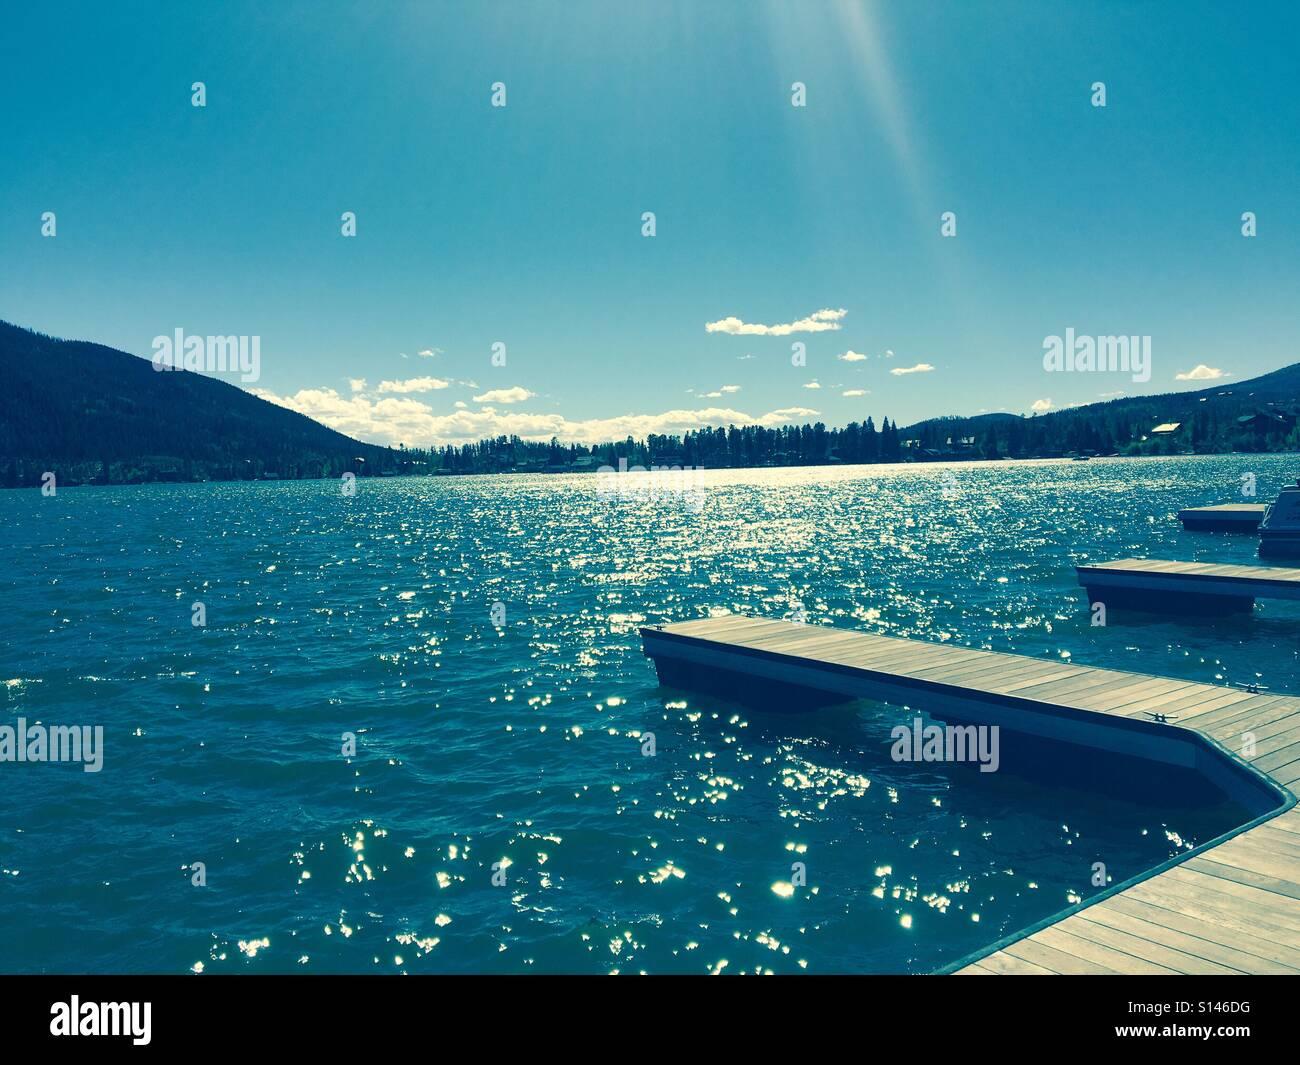 Beautiful lake in between mountains - Stock Image